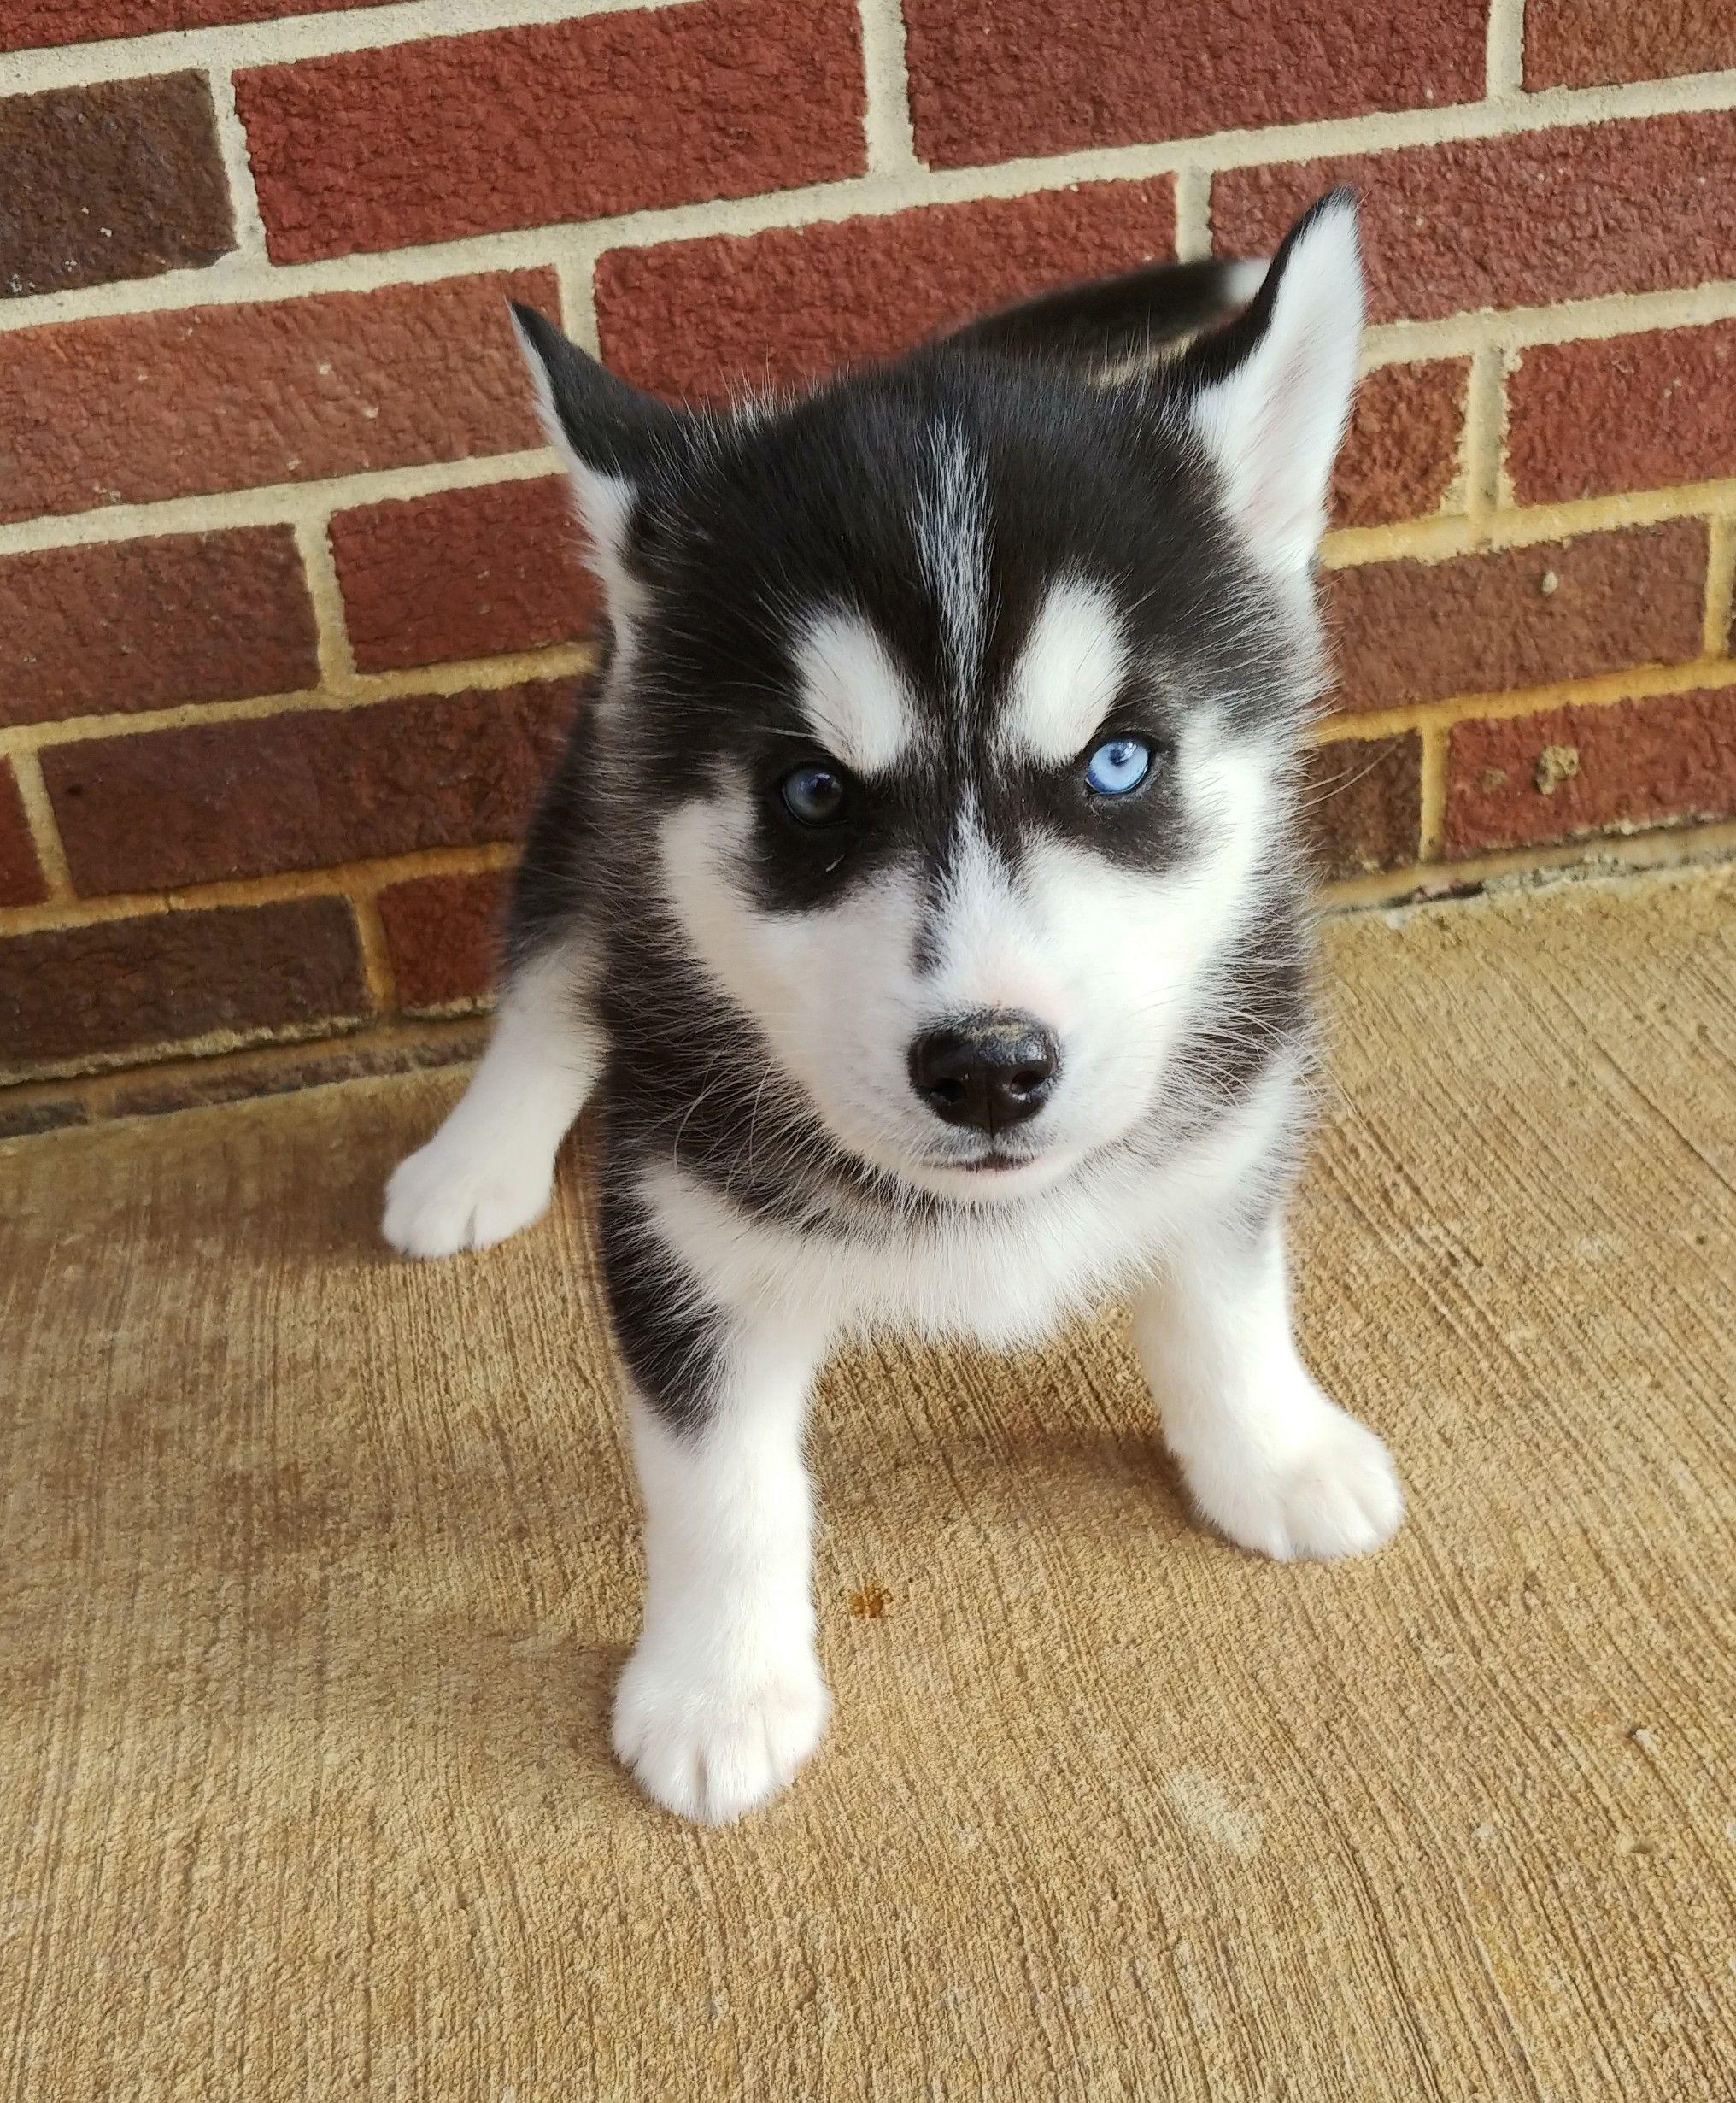 Rosie Aca Siberian Husky Puppy For Sale At Grabill Indiana In 2020 Husky Puppies For Sale Puppies For Sale Husky Puppy